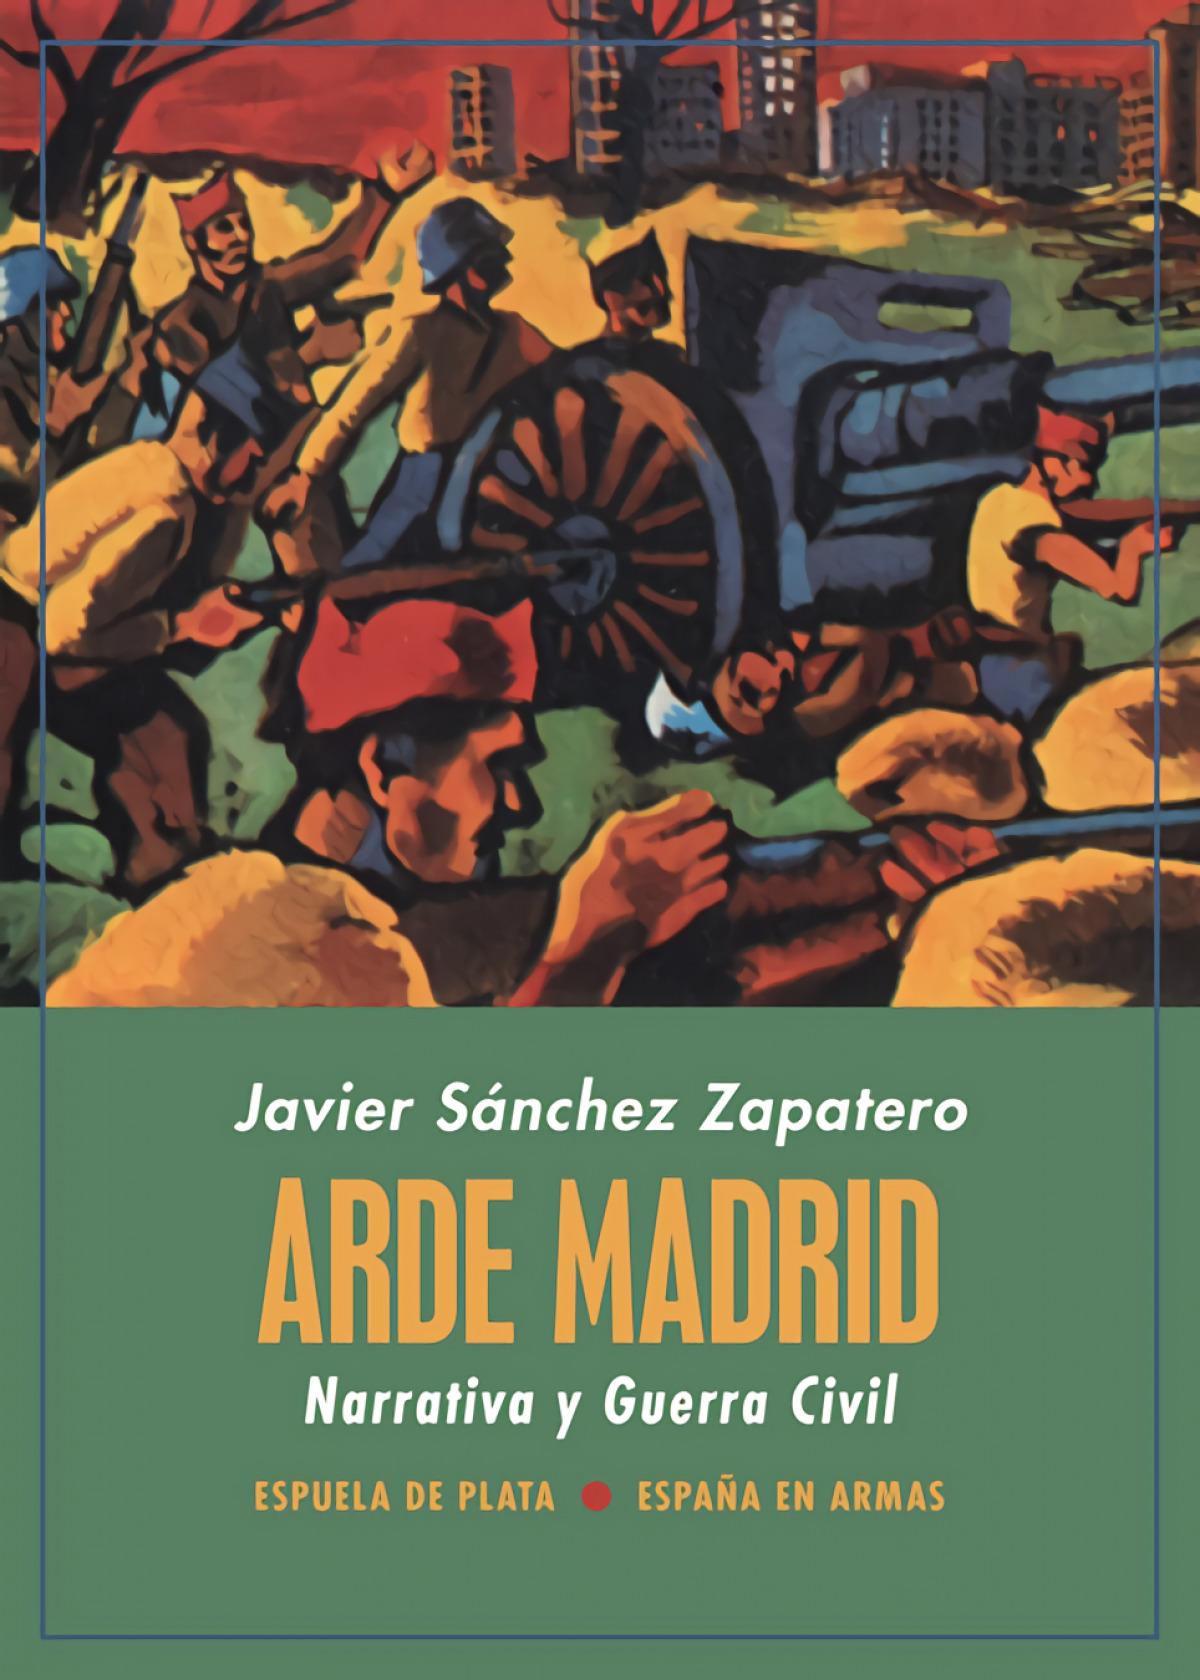 Arde Madrid. Narrativa y Guerra Civil